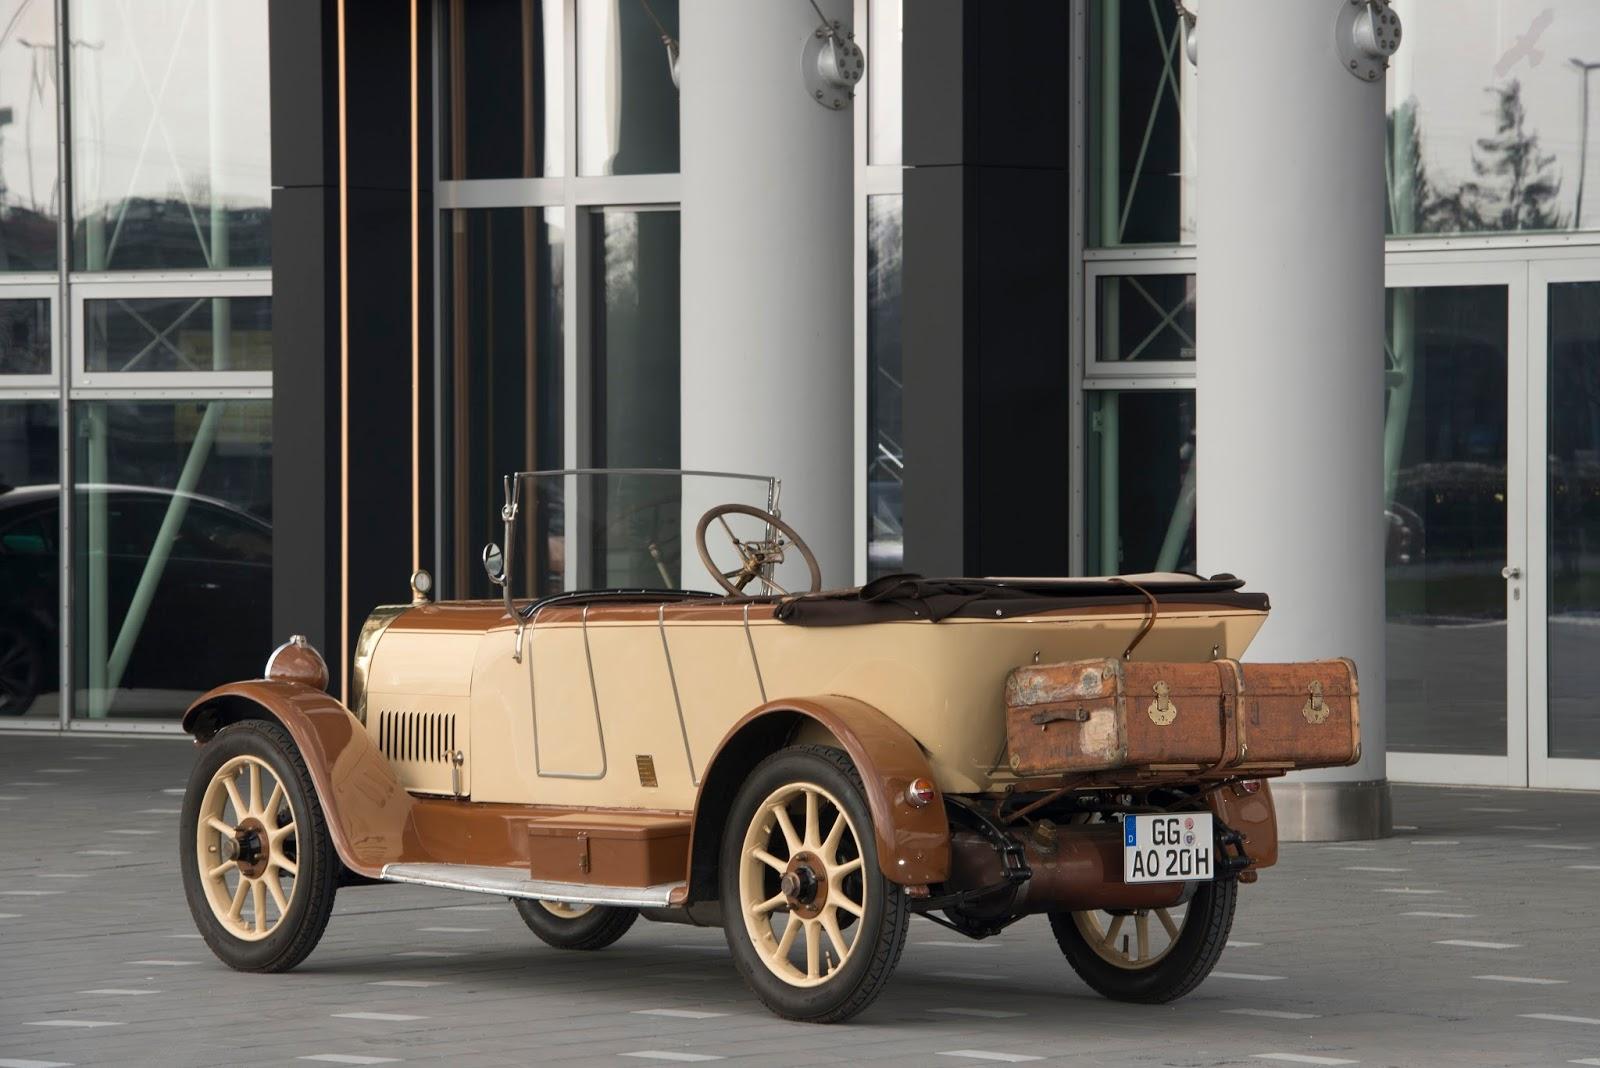 Opel Rallye Hessen Th25C325BCringen 301760 H Πλούσια Κληρονομιά των Opel Cabrio cabrio, Opel, Opel 8/25 hp, Opel Cascada, Opel Olympia, Opel Record, Opel Super 6